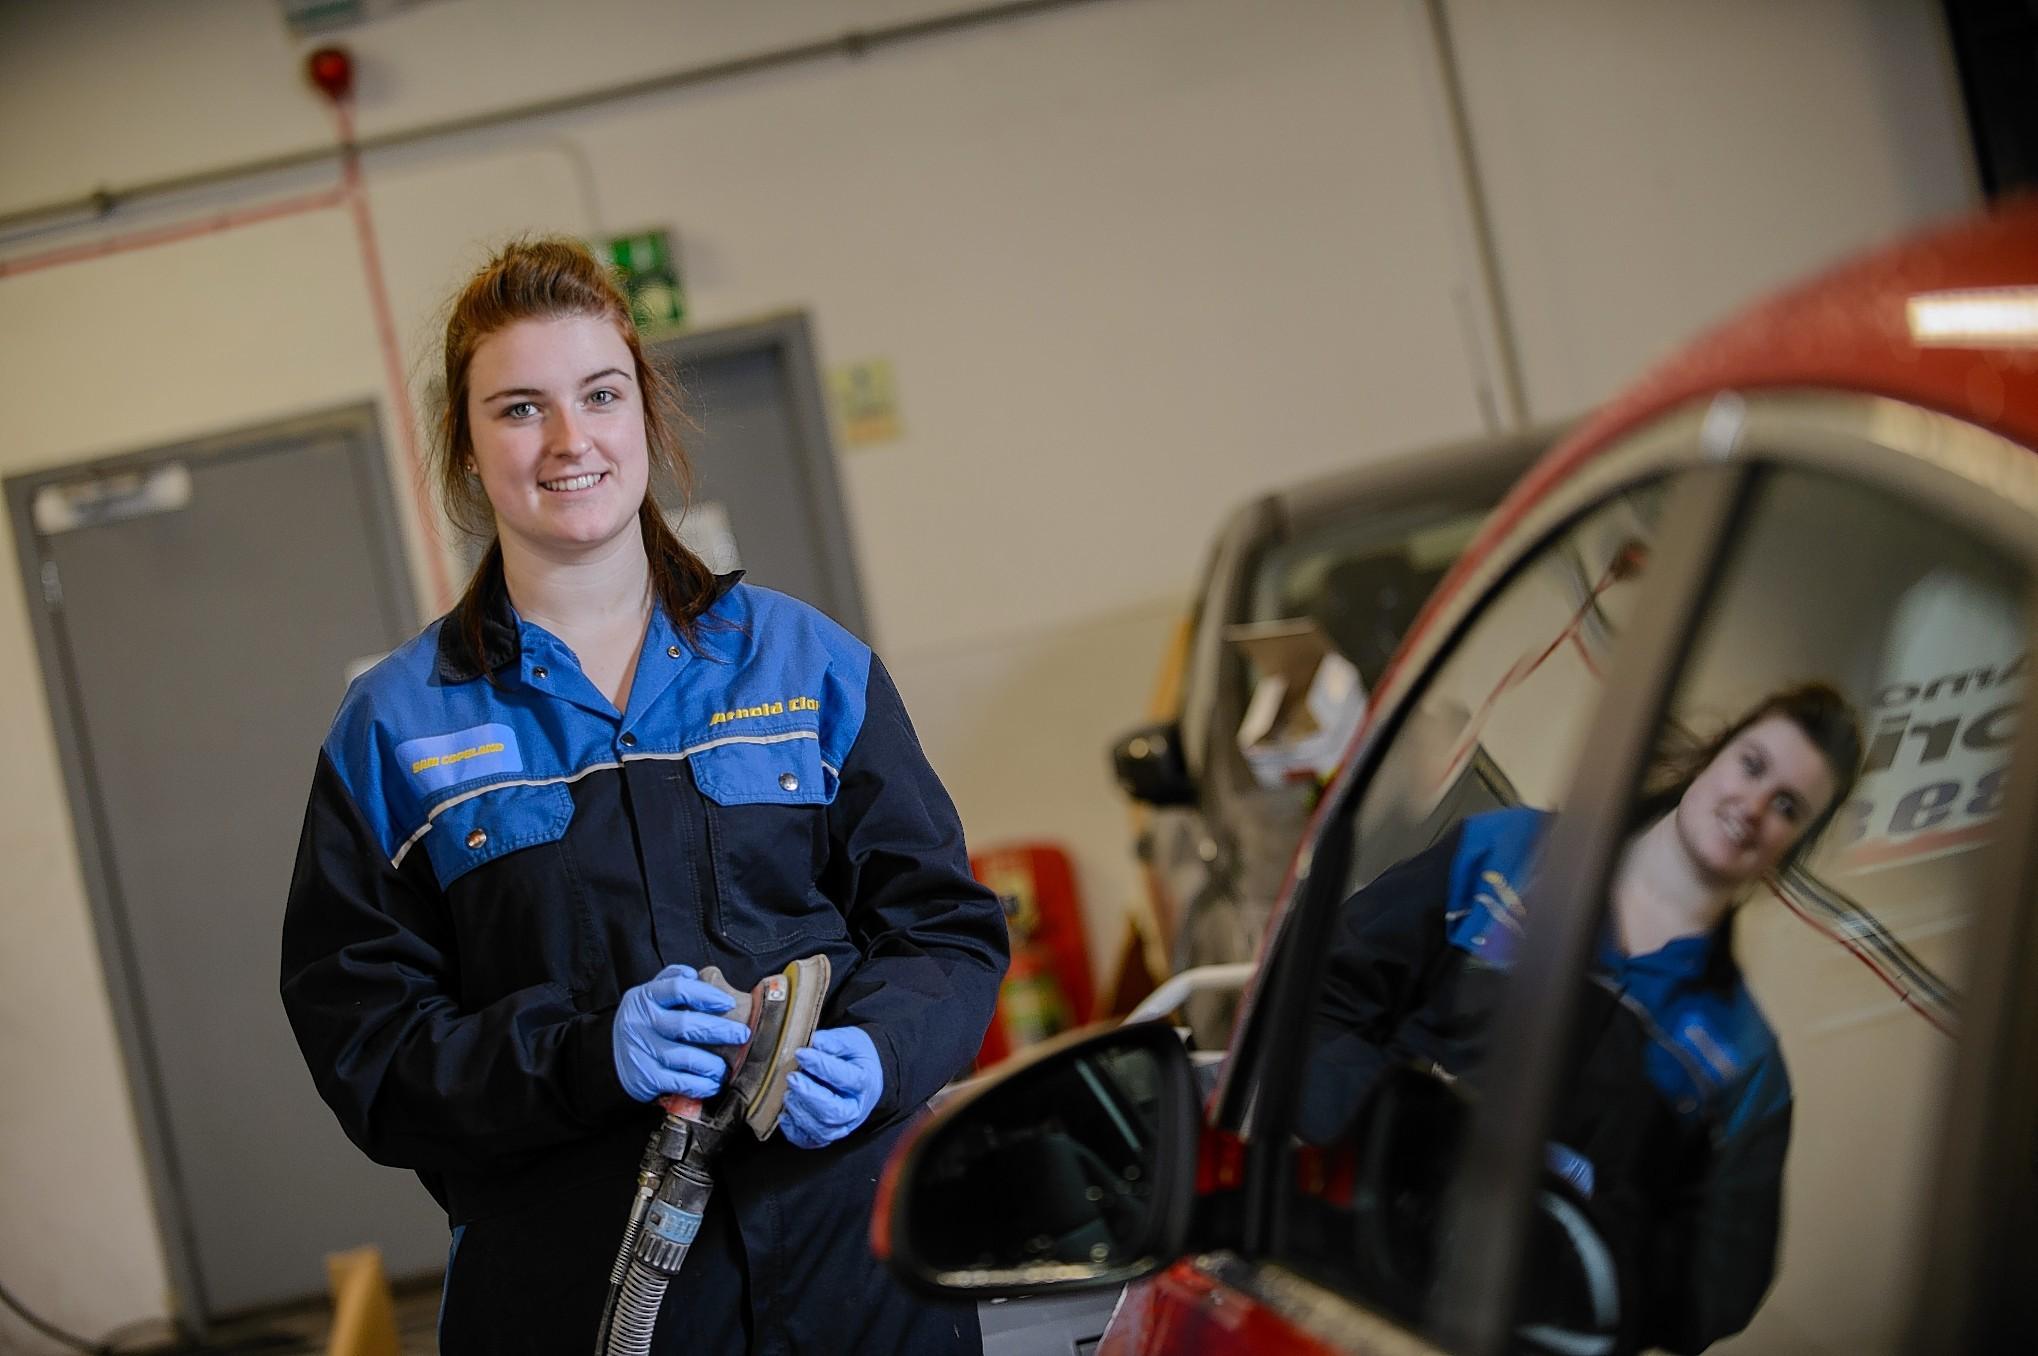 Samantha Copeland, an apprentice refinisher at Arnold Clark in Aberdeen